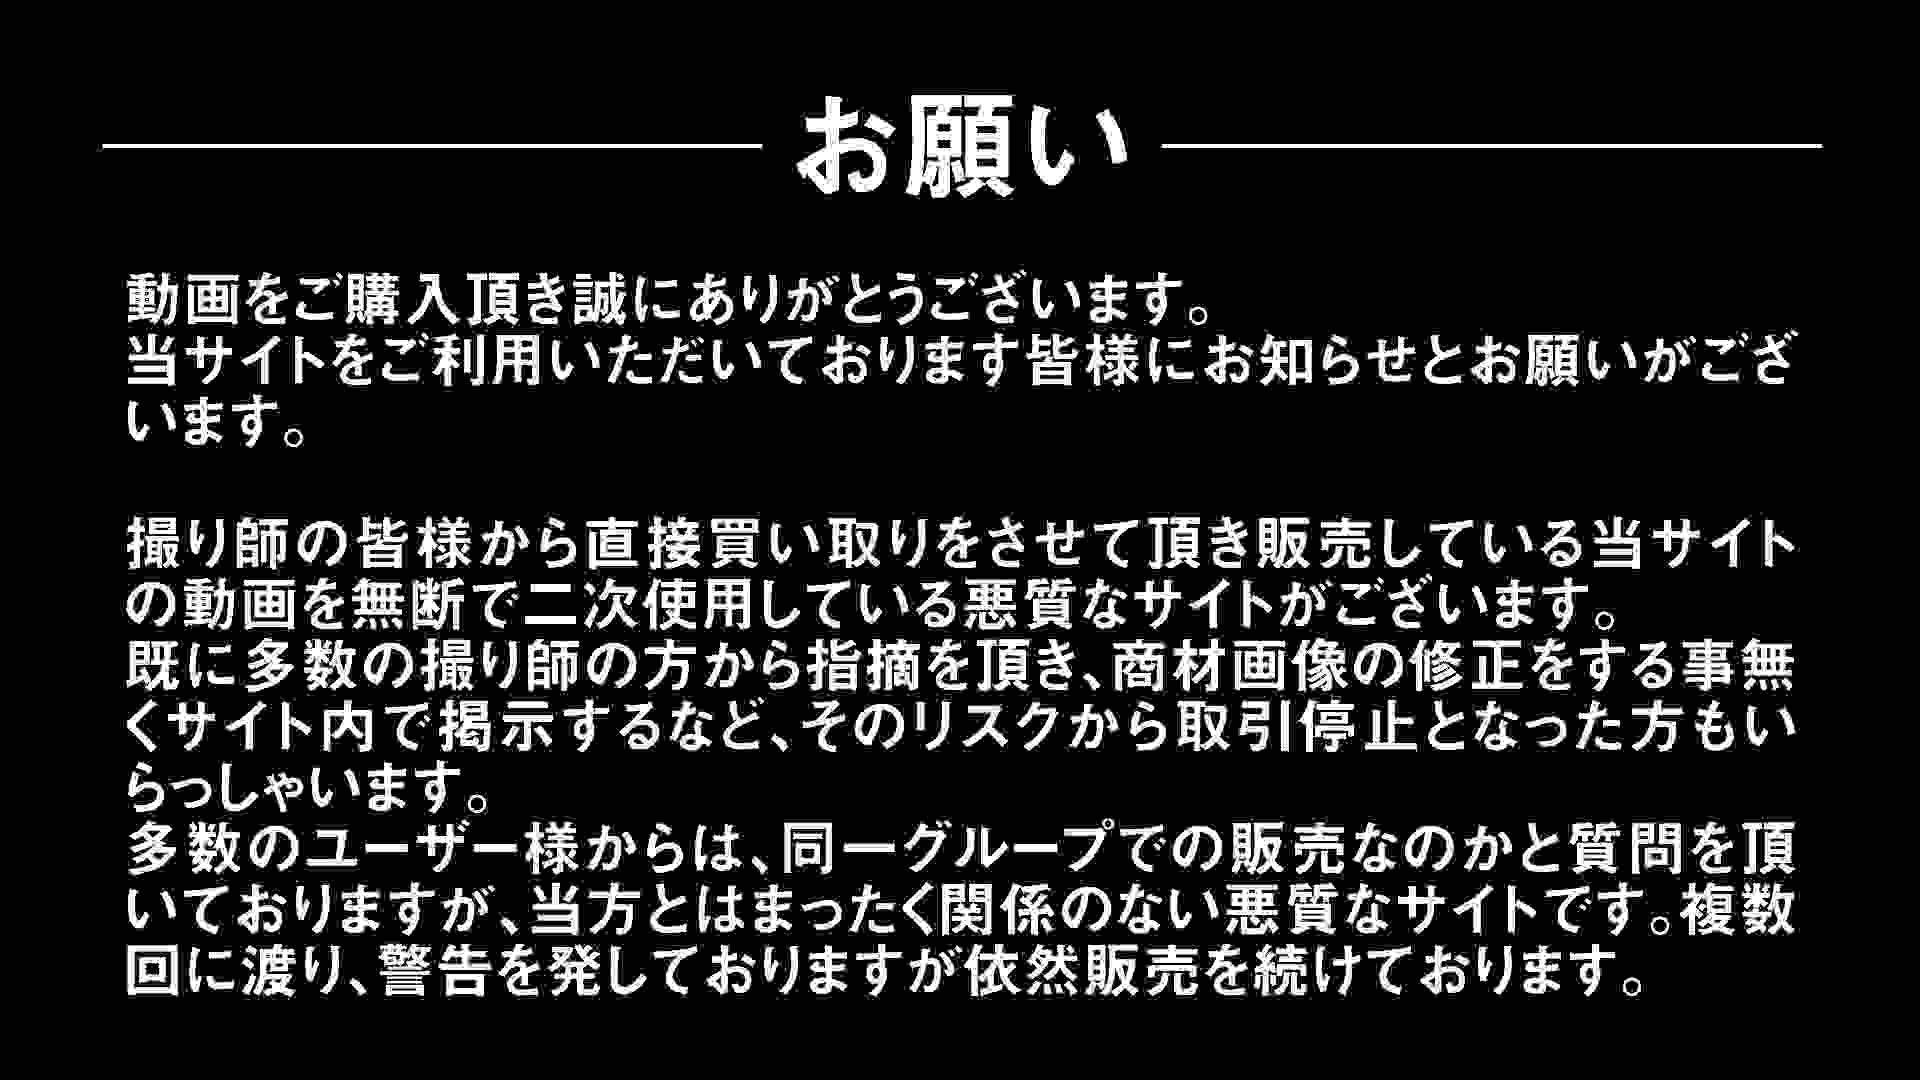 Aquaな露天風呂Vol.297 女体盗撮   OL女体  91連発 1